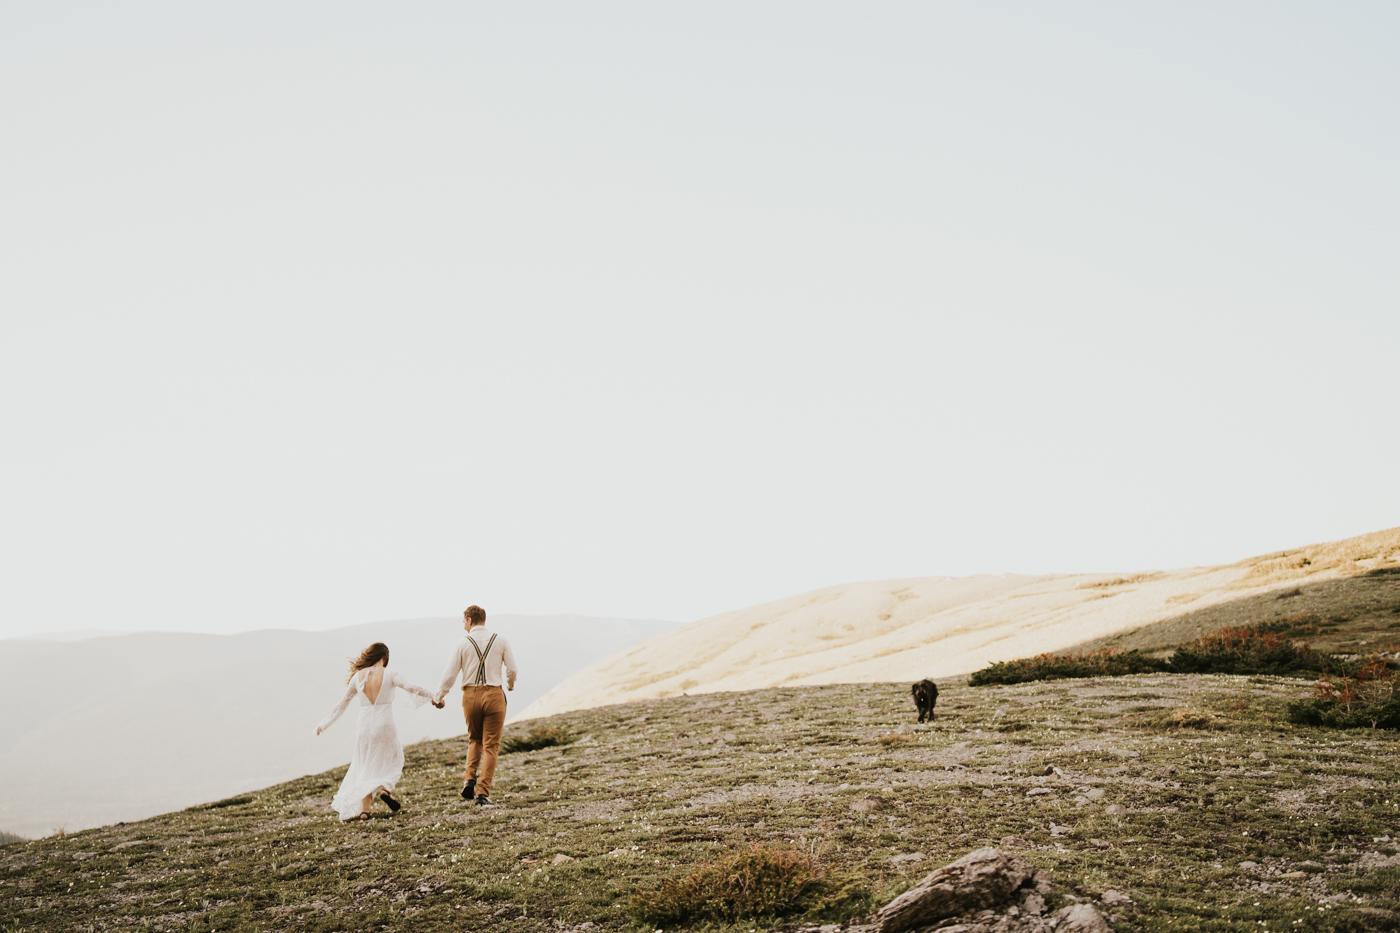 tyraephotography_photographer_wedding_elopement_engagement_photography-08082.jpg